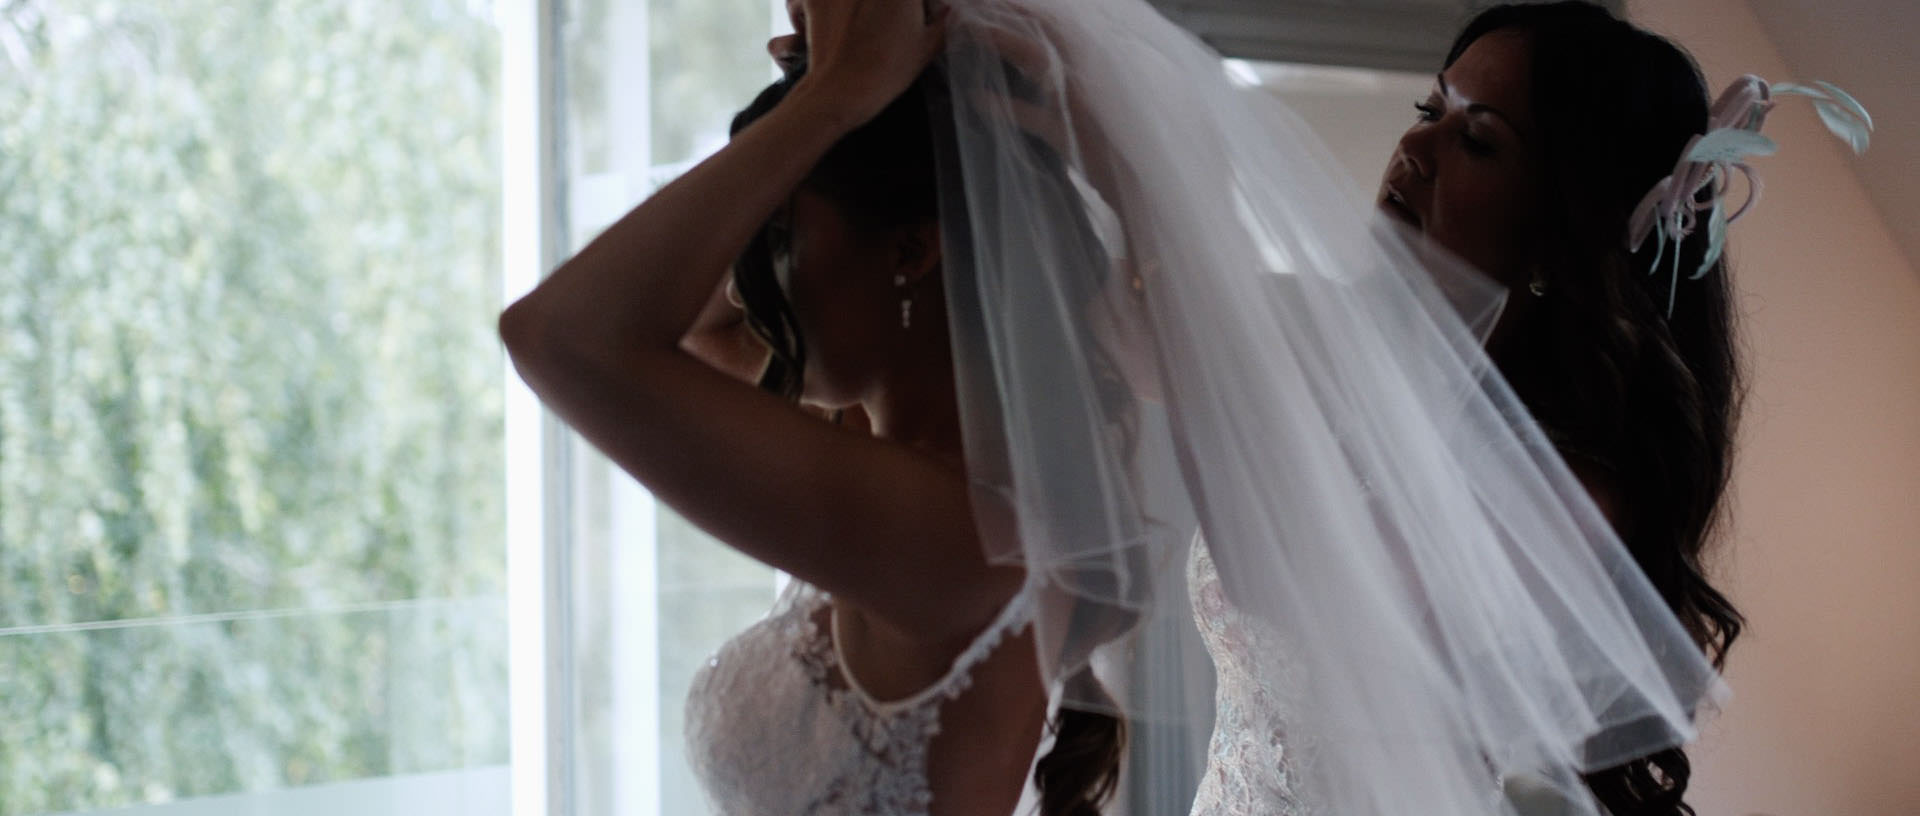 Hyde Barn Colswolds Wedding Verity-Jade & Kai 15 Cropped.jpg